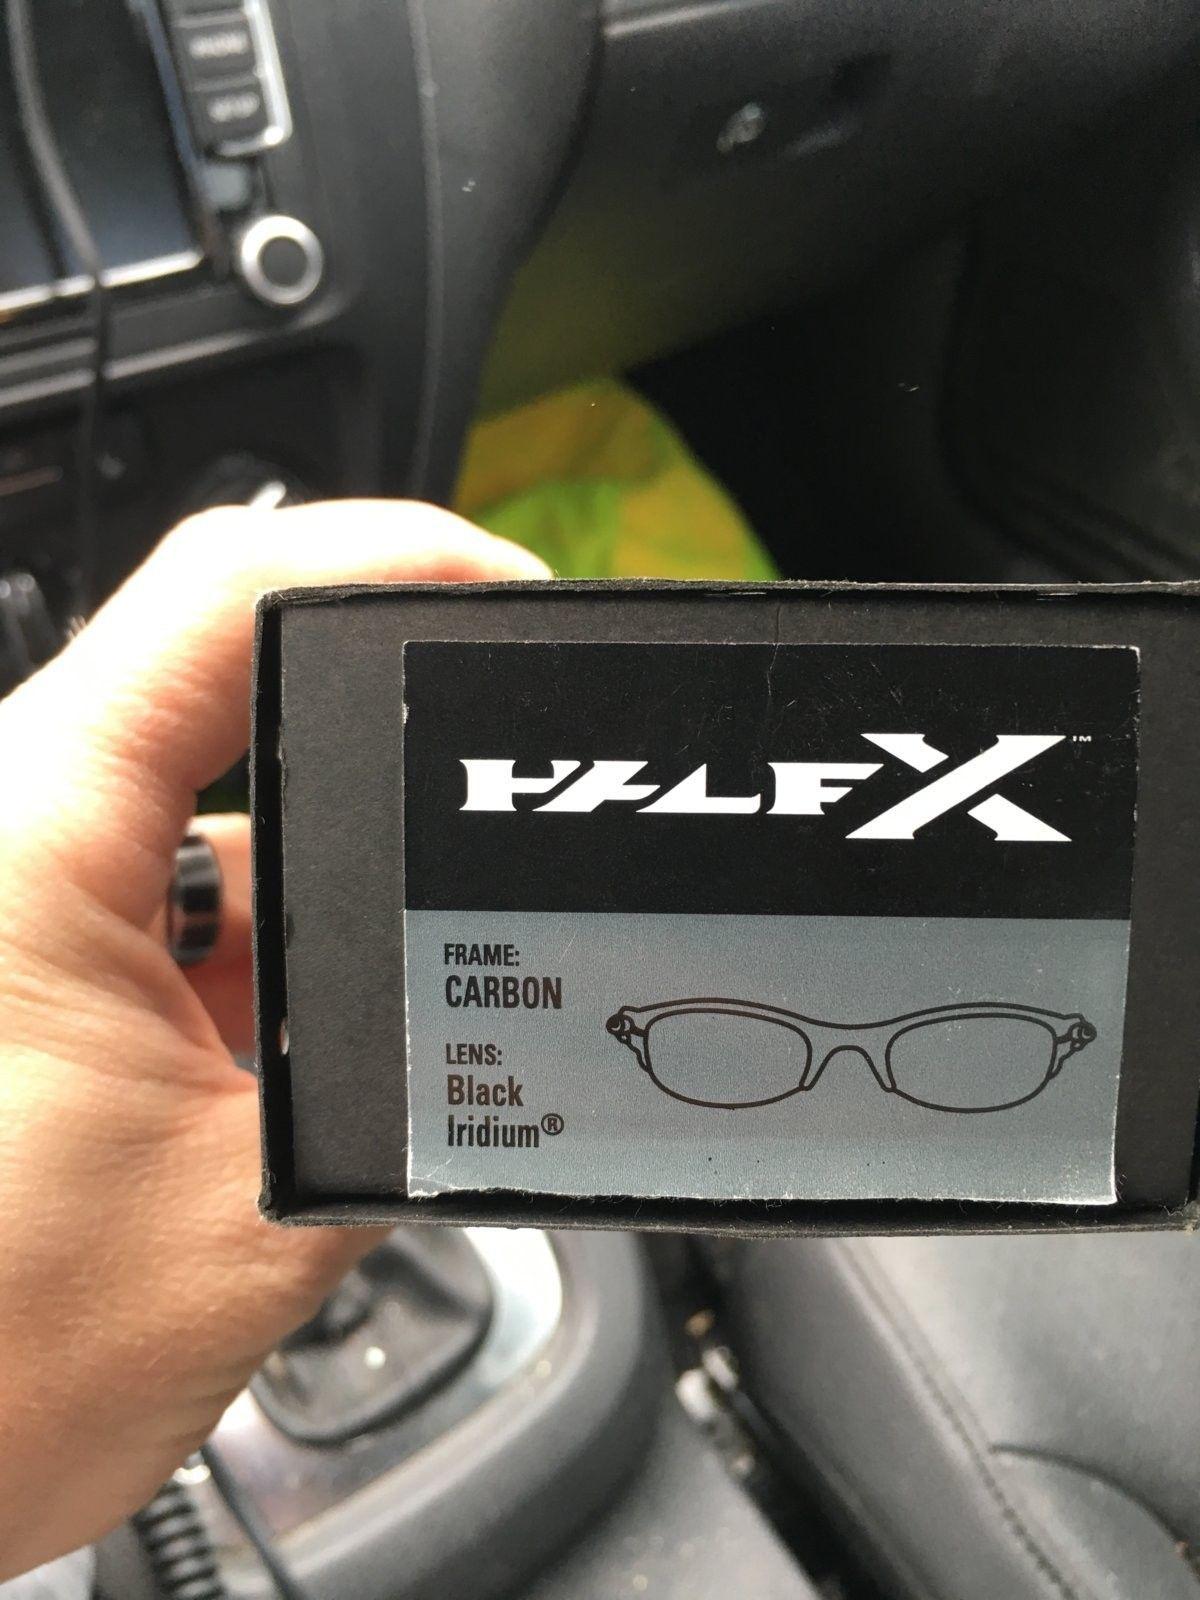 New half X! - image.jpeg